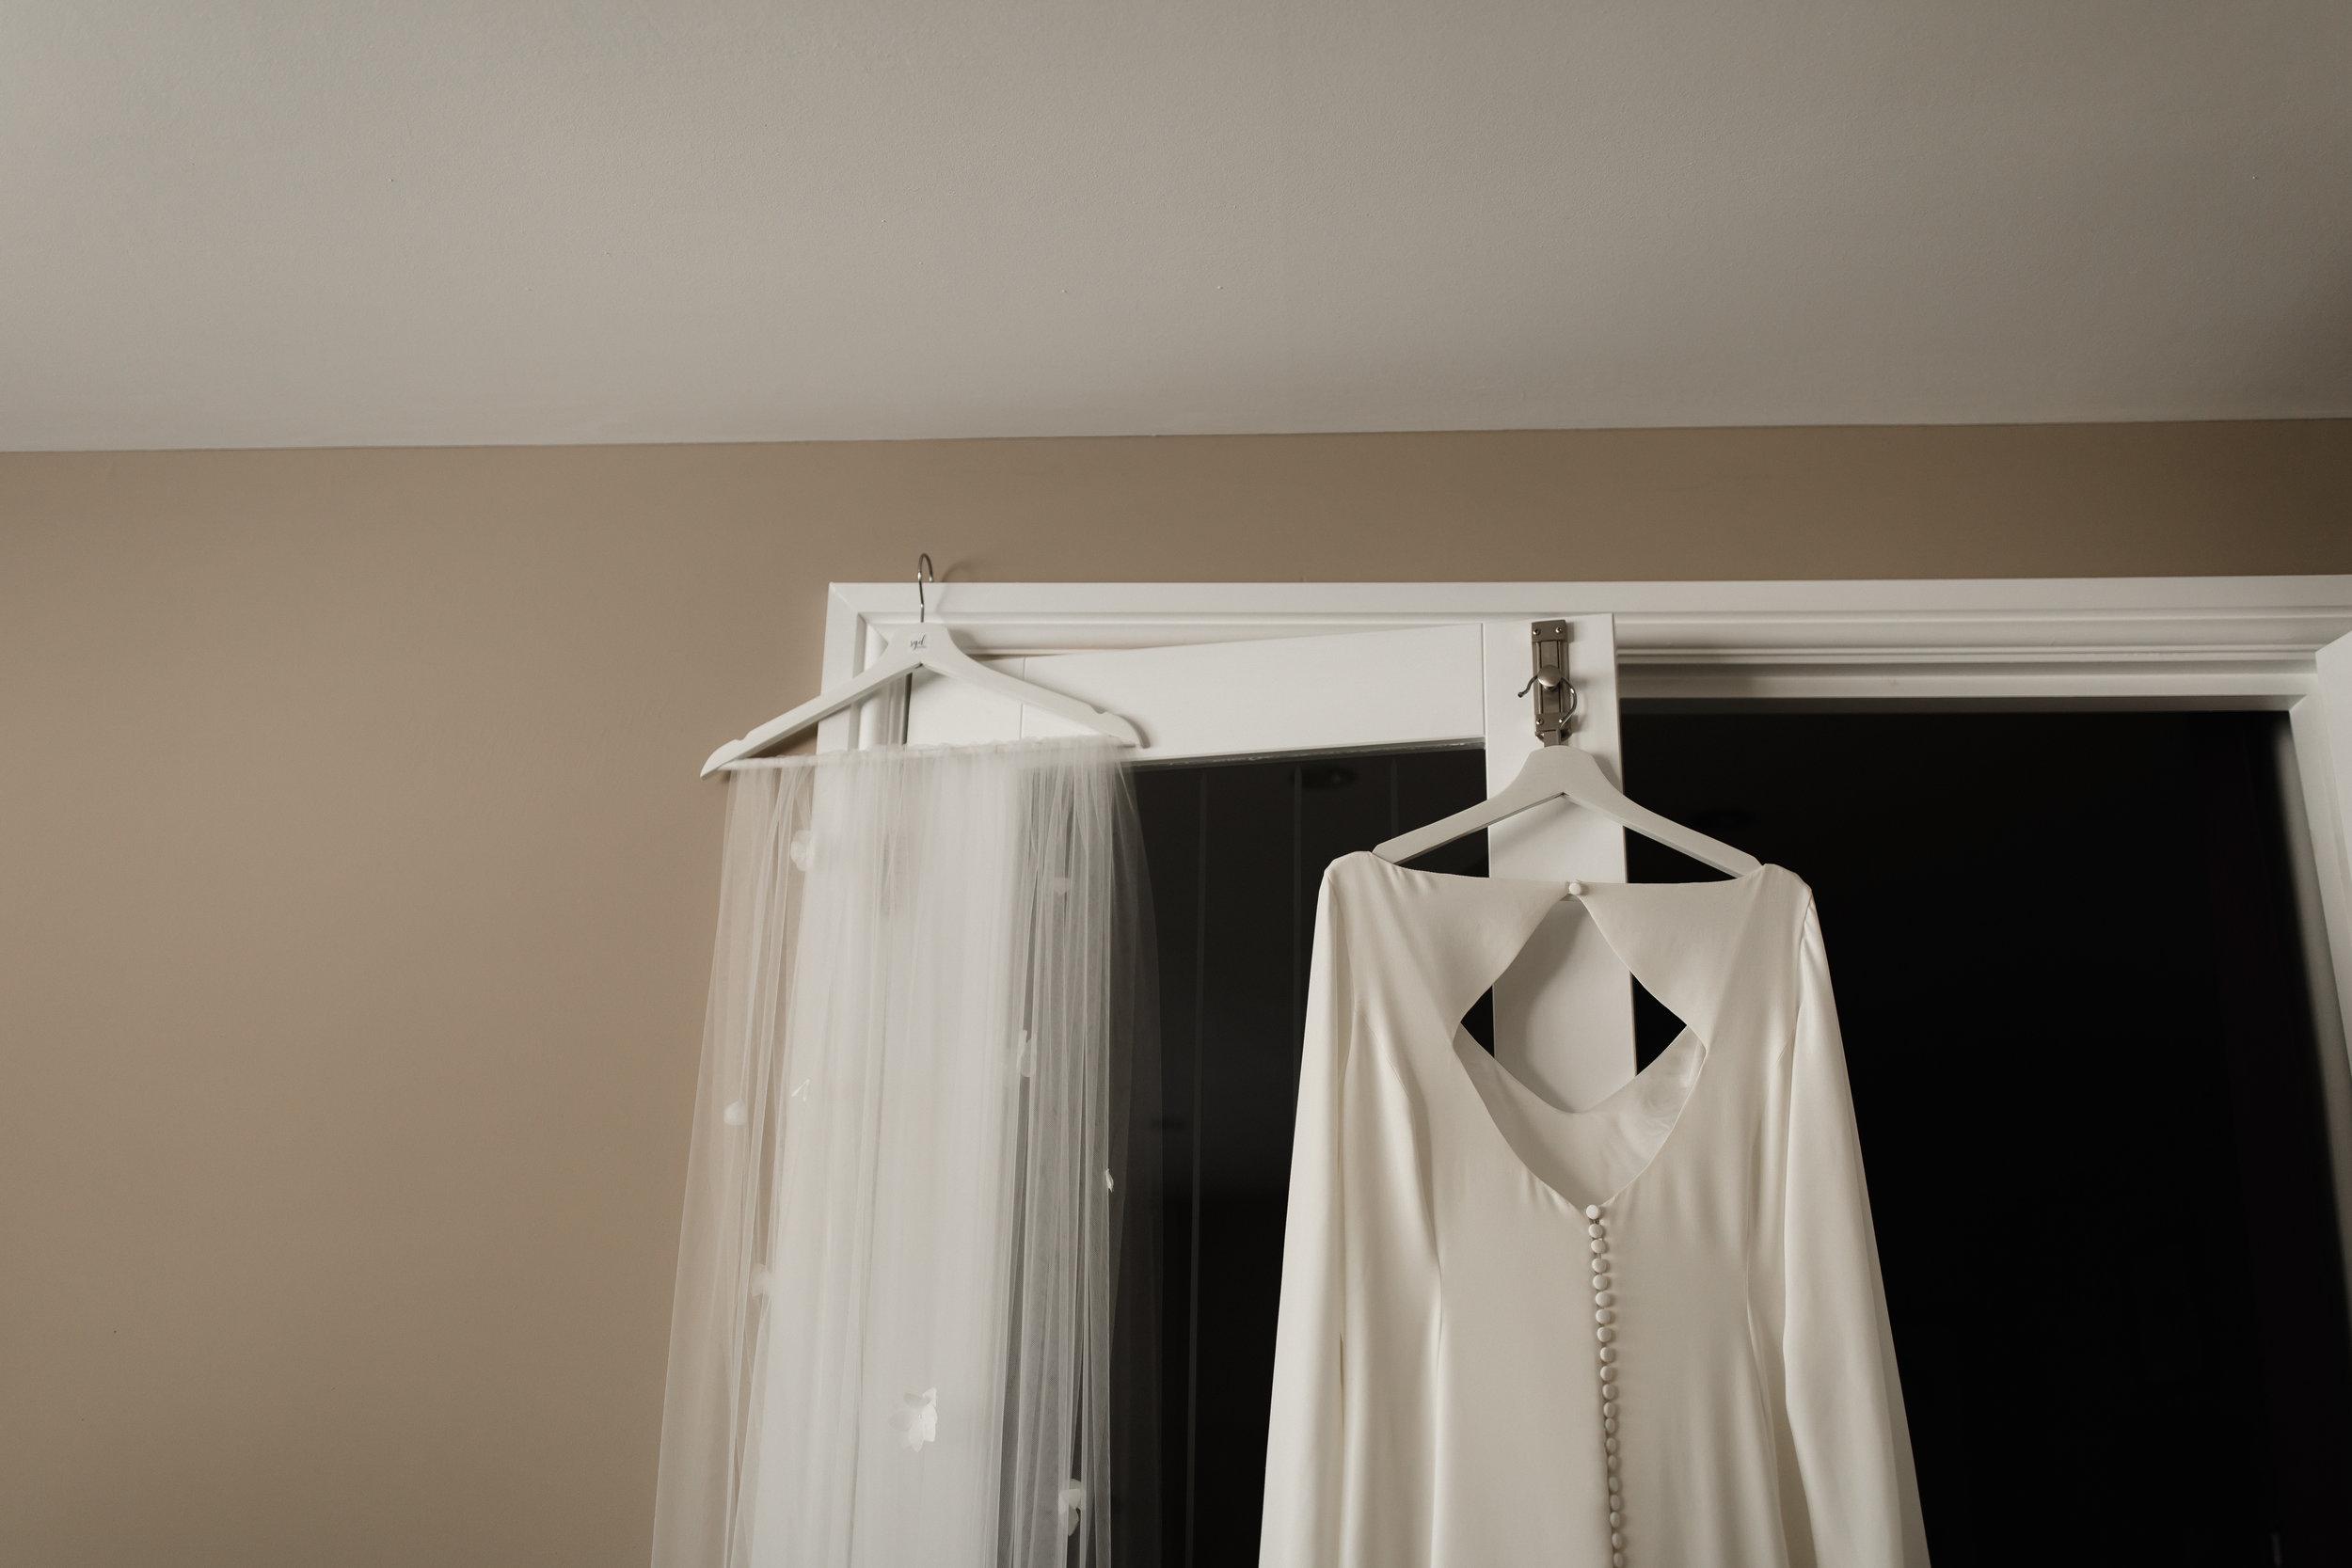 Lauren-Peak-District-Bespoke-Wedding-Gown-Petal-Veil-Train-Long-Sleeve-Susanna-Greening-Designs-Matlock-Derbyshire-3